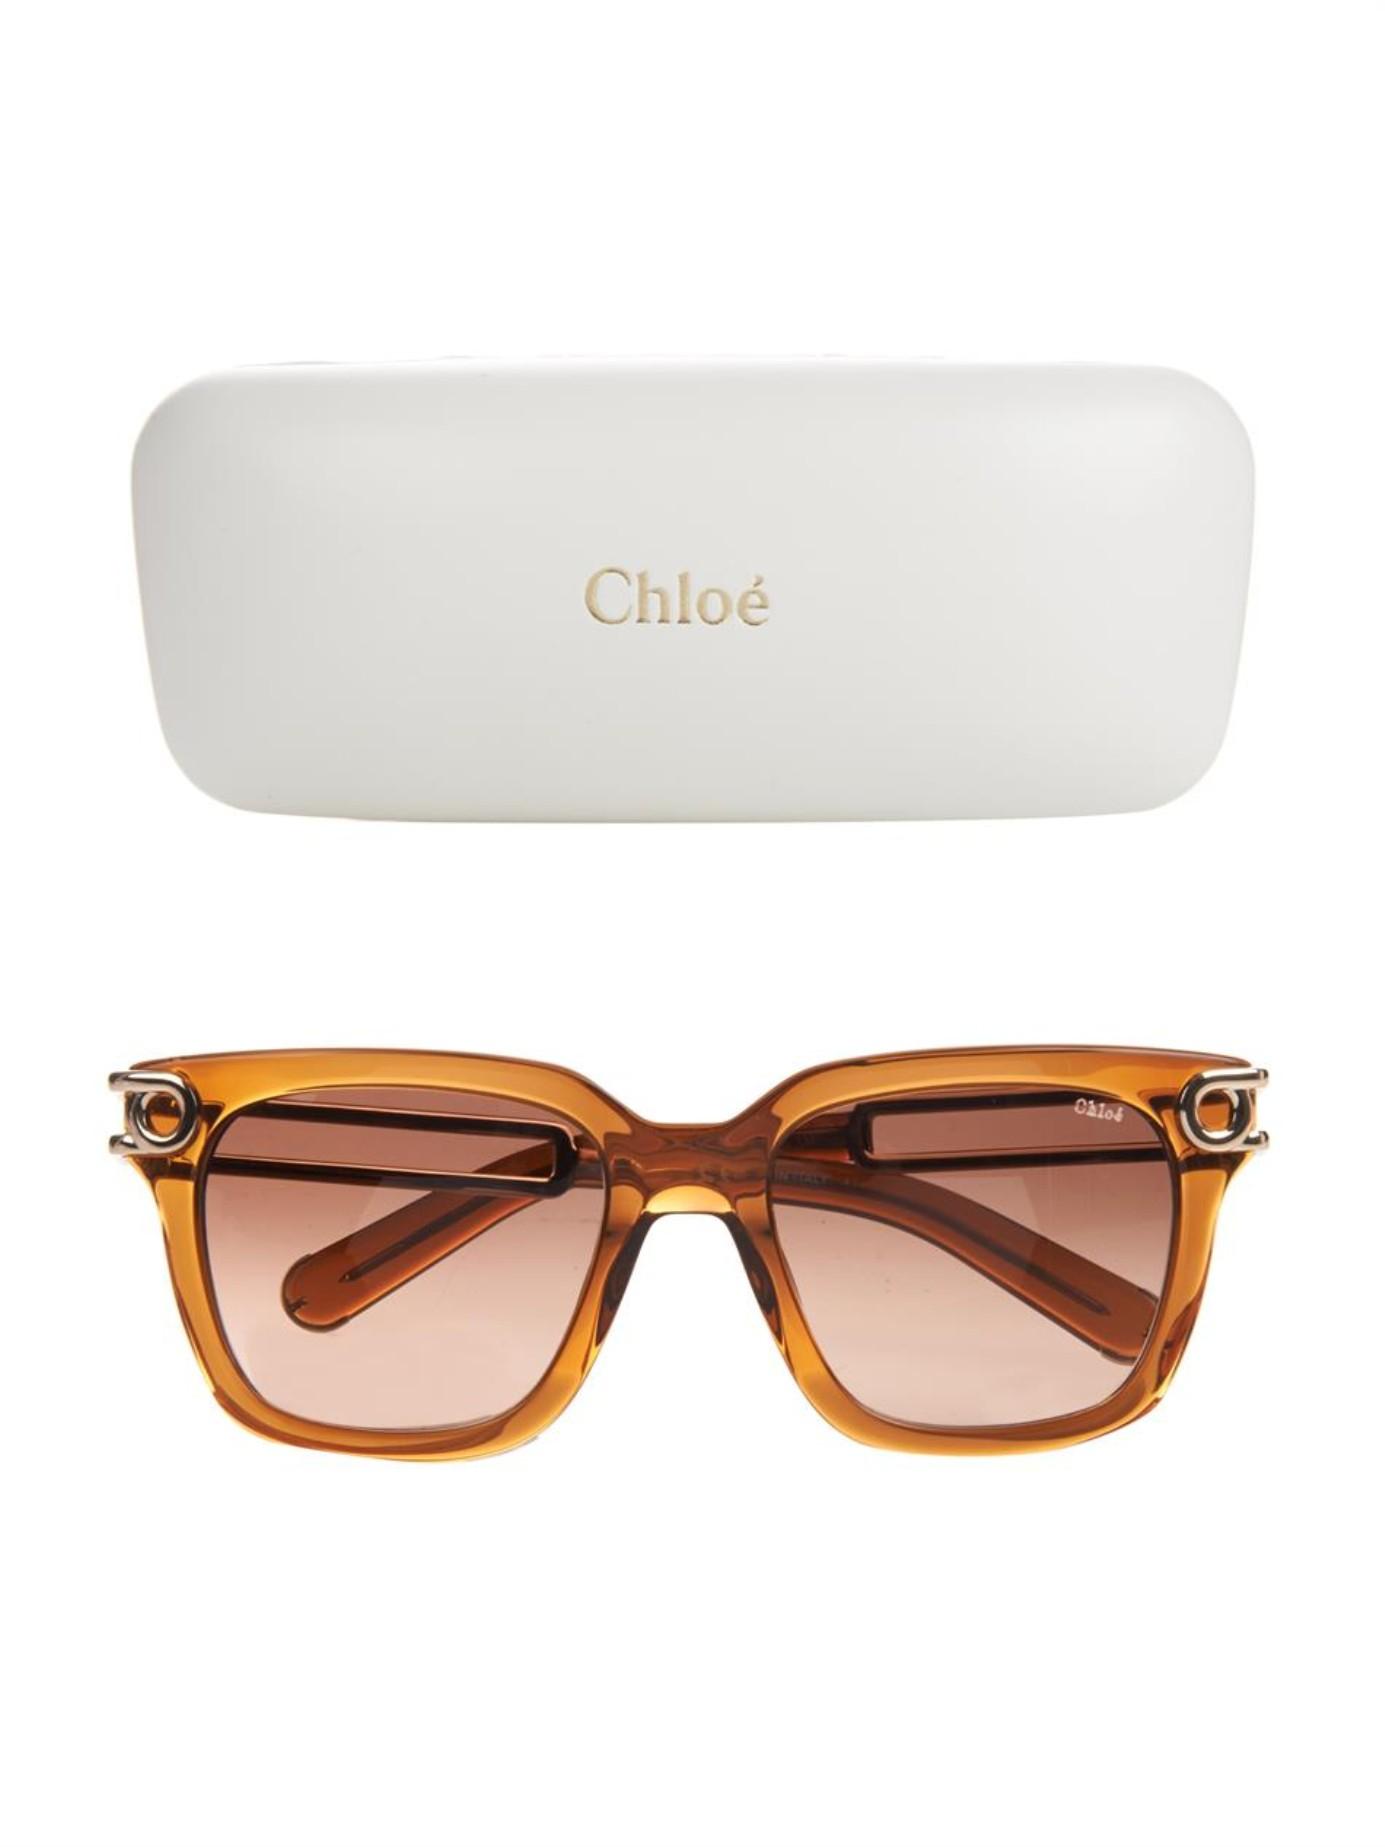 e865c75392d Lyst - Chloé Cate Square-Framed Sunglasses in Brown